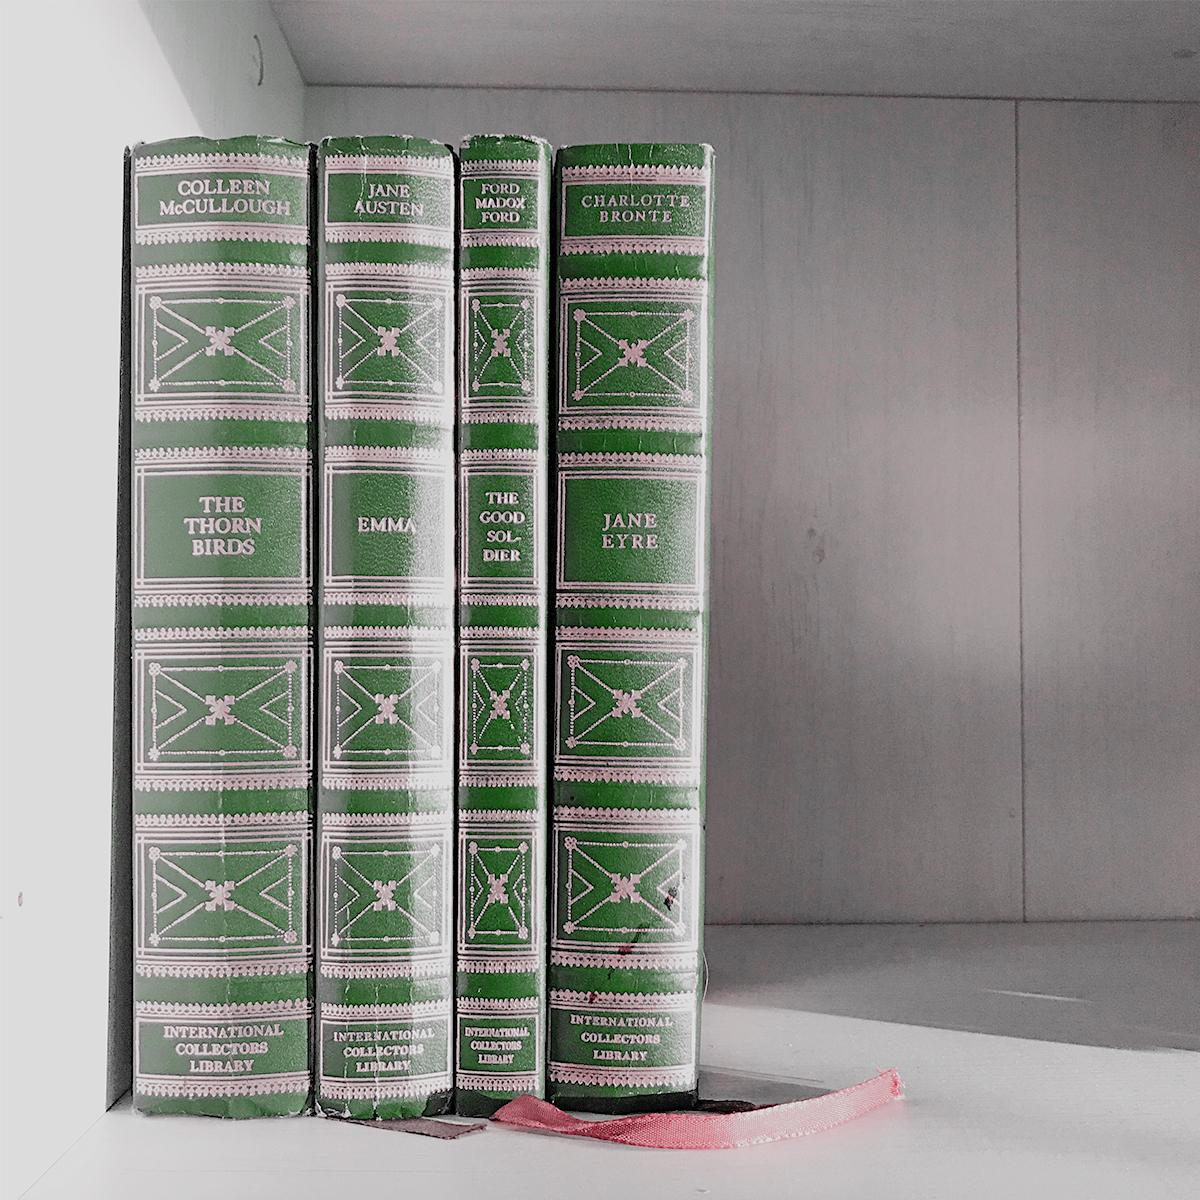 Pastel Pink & Green Aesthetics & Photography by KAESPO Design + Branding